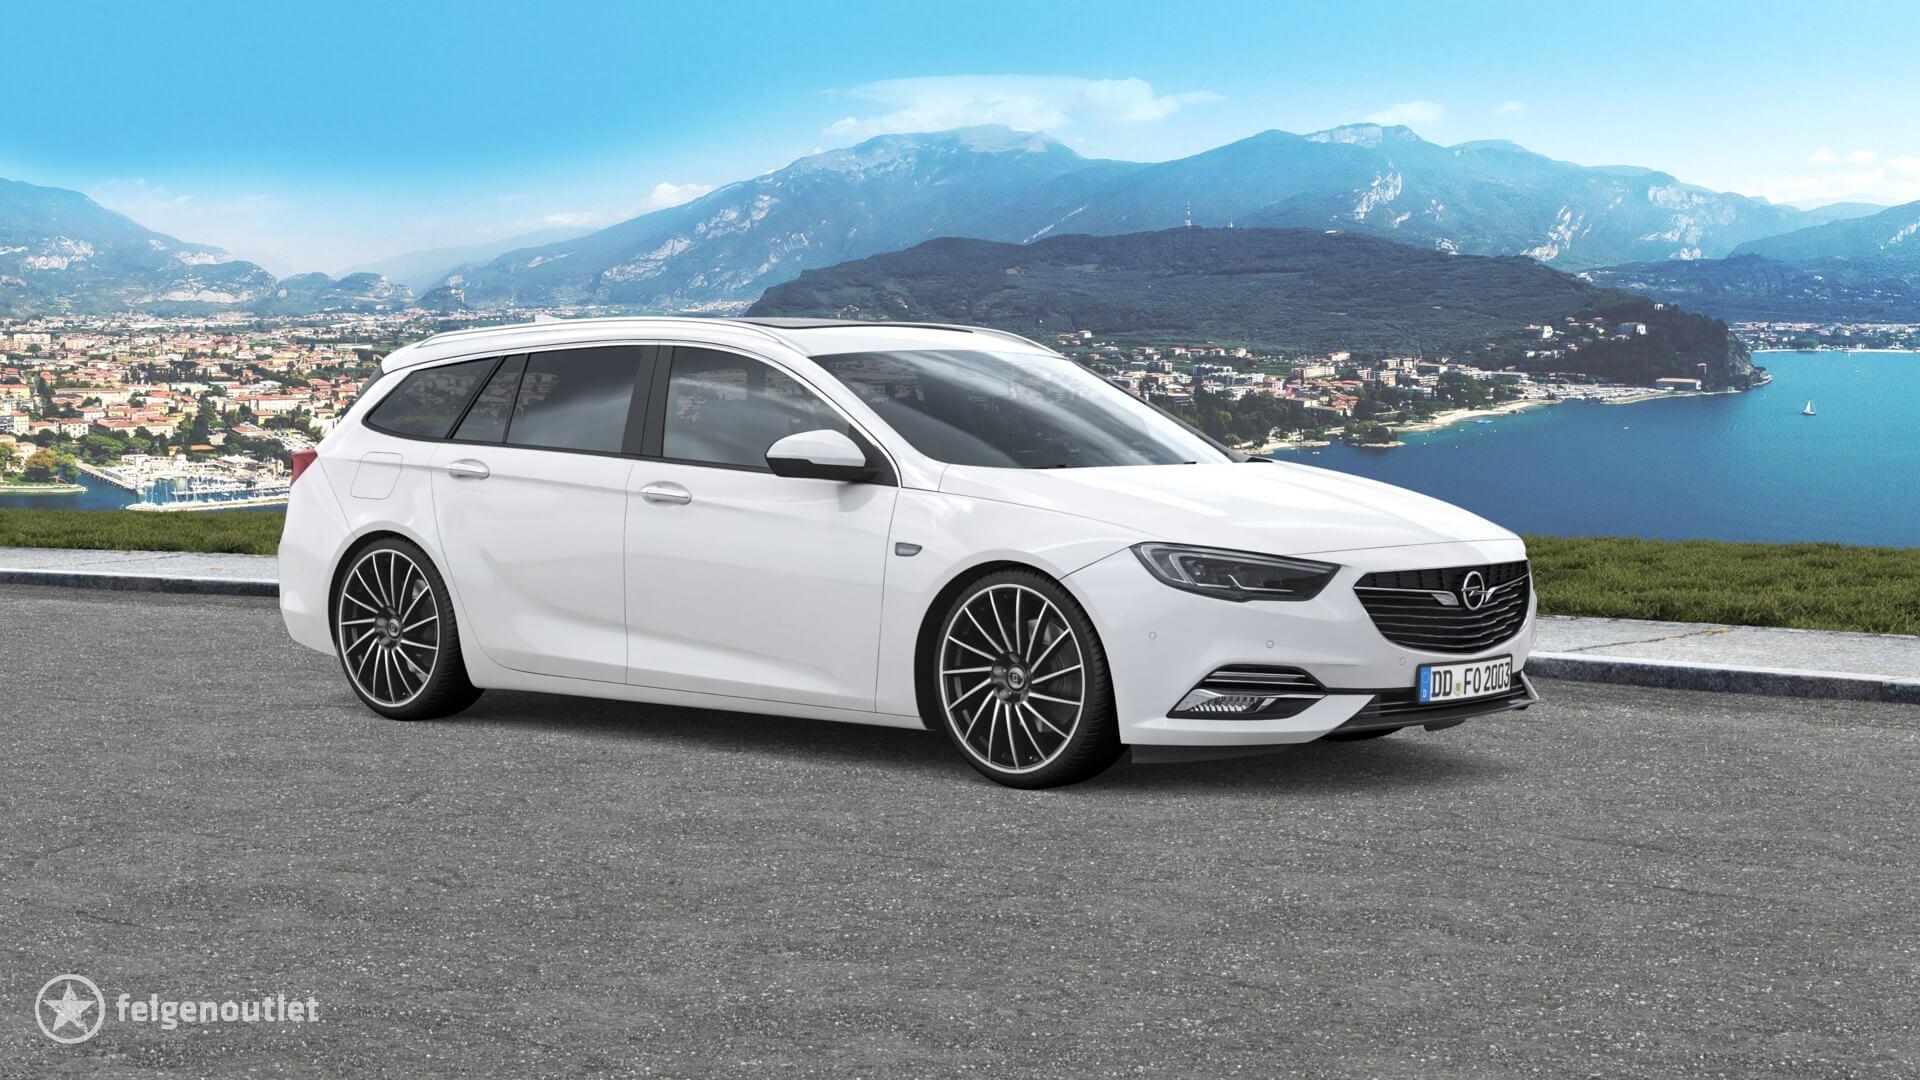 Diewe Briosa nero machined Opel Insignia Sports Tourer